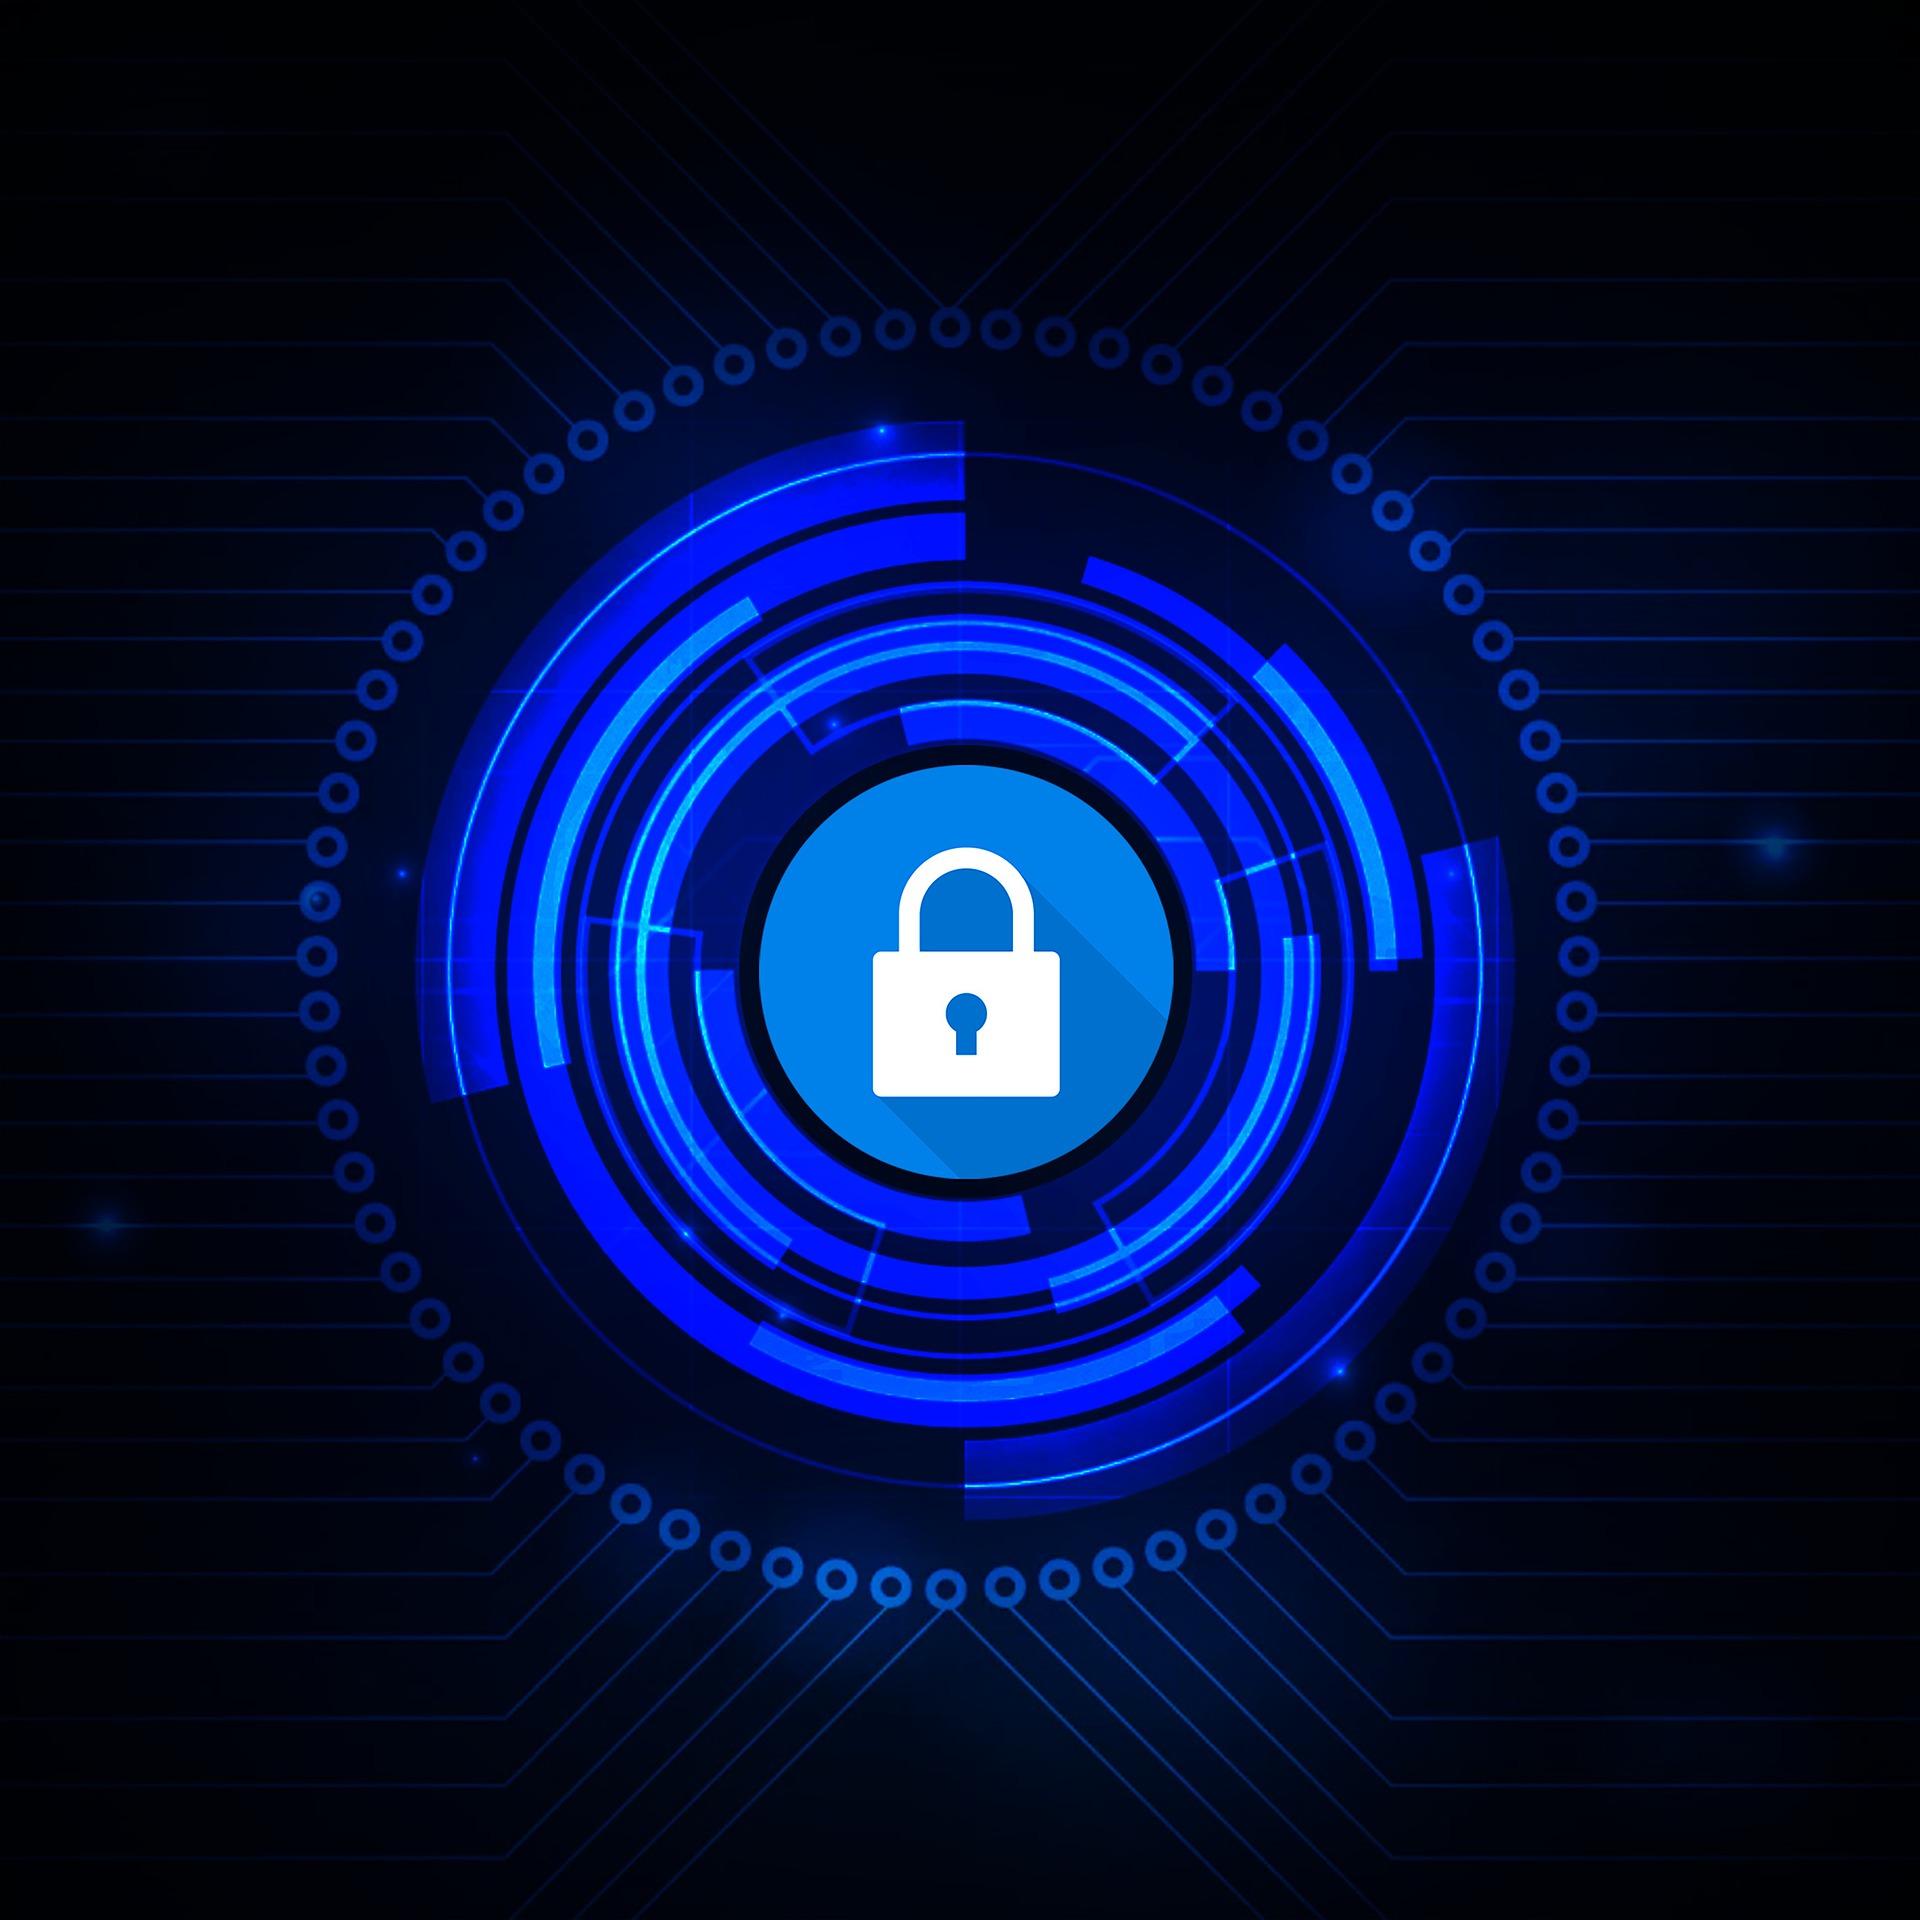 cybersecurity_pxb_neon-5502633_1920